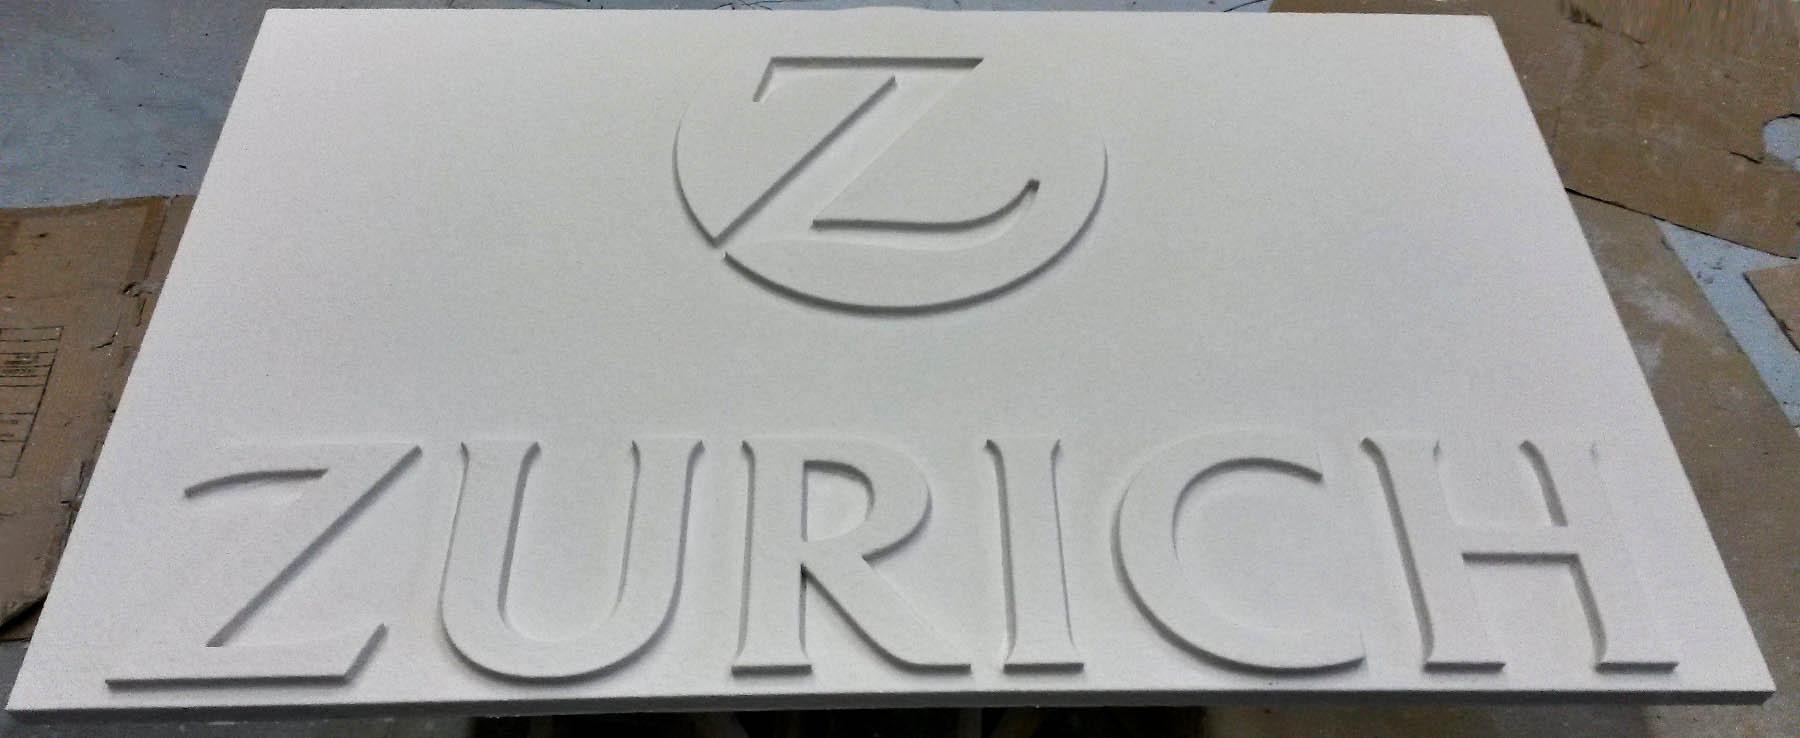 scritta 3d e logo in polistirolo